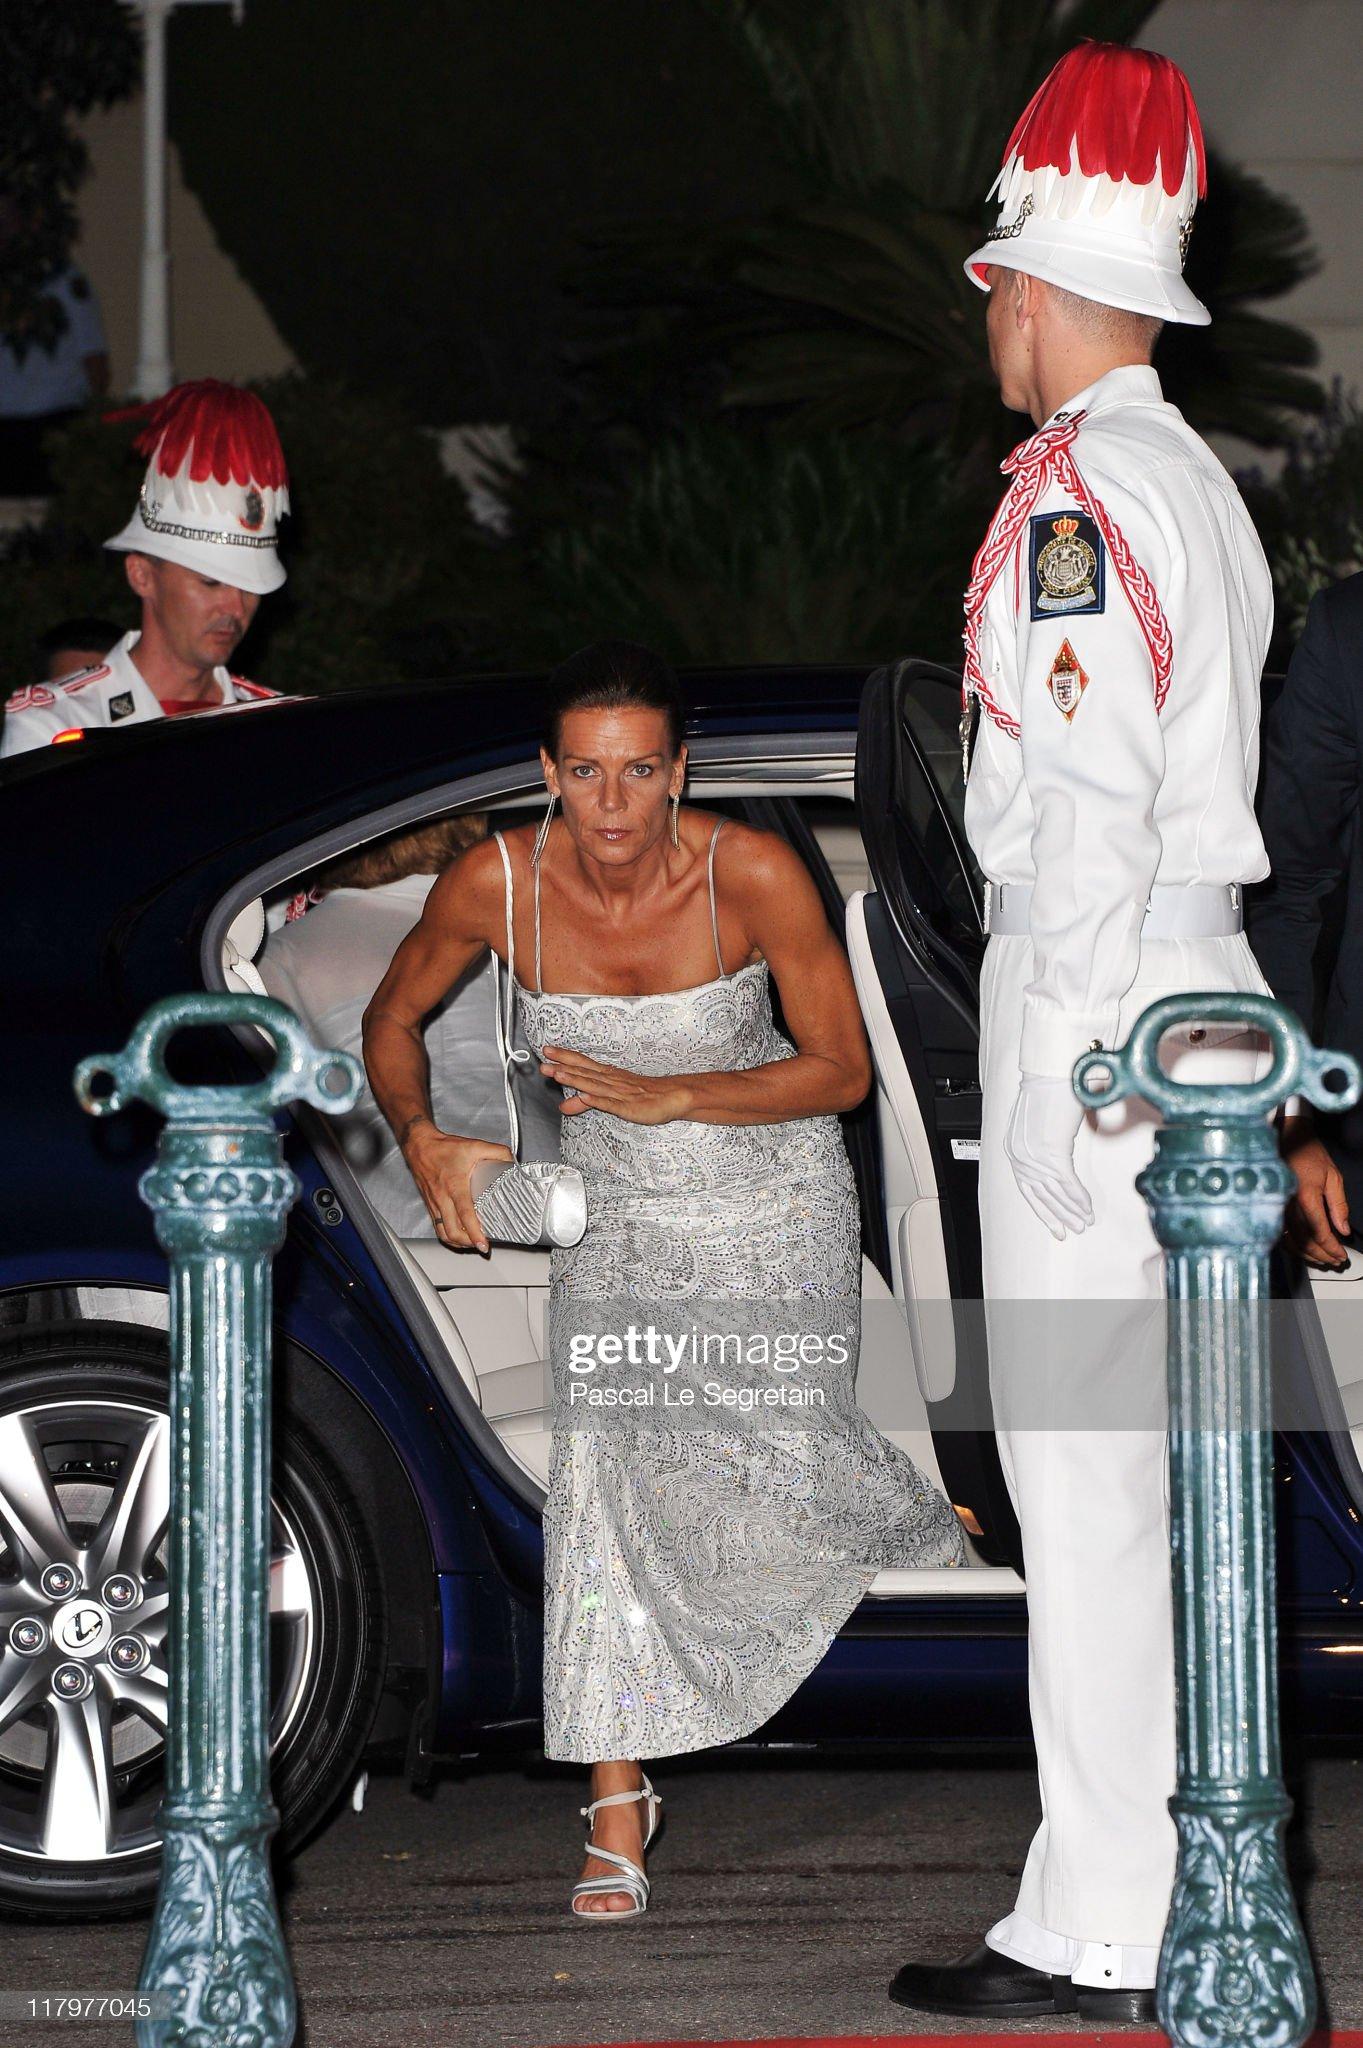 Monaco Royal Wedding - Dinner and Fireworks : News Photo